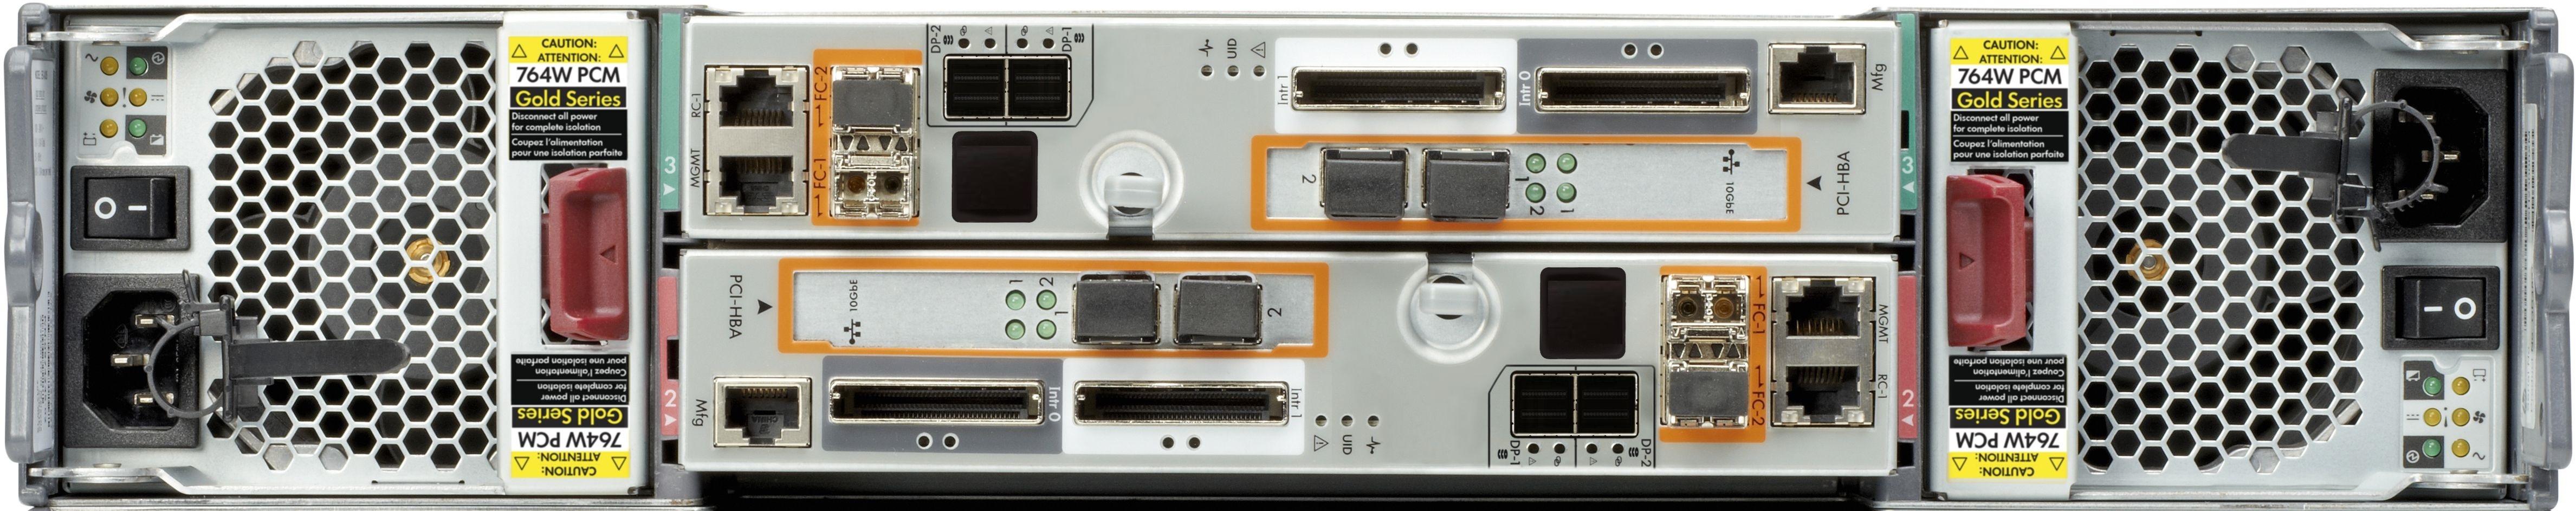 HPE 3PAR StoreServ 8200 Rear